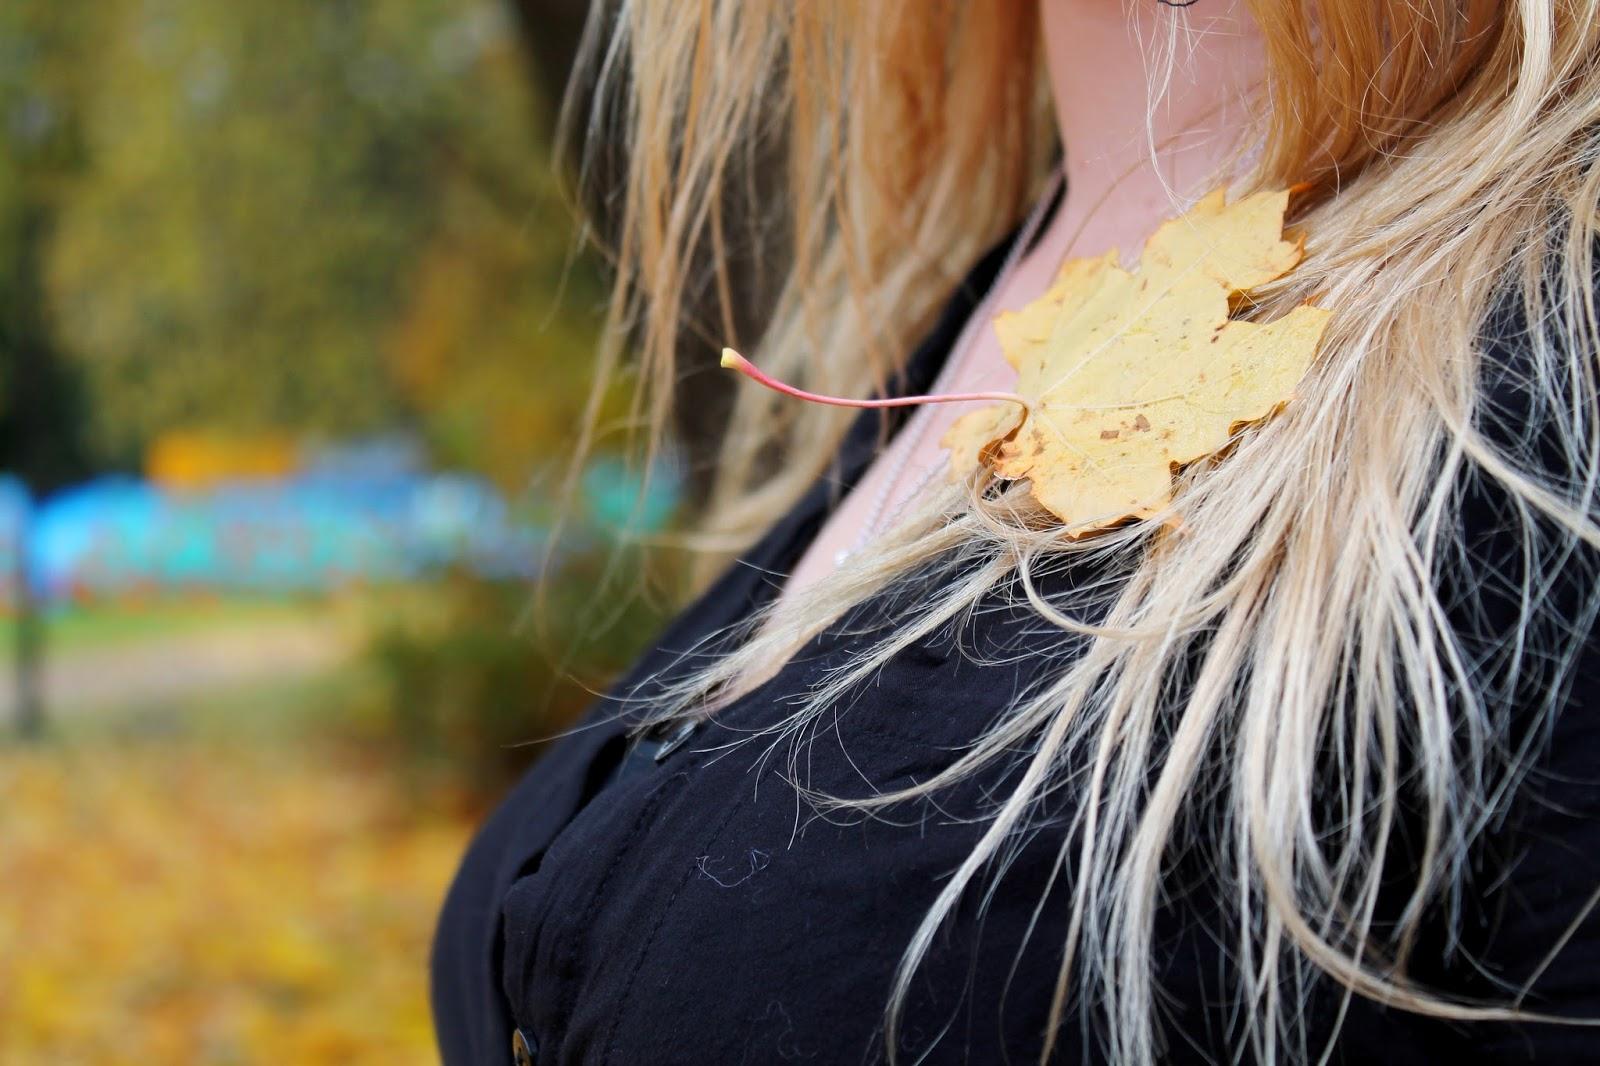 leaf, autumn, fall, seasons, changing, stuck, hair, beauty, kosmetics, hius, kampaus, koriste, piece, accessorize, accessories, in, hiukset, tyyli, black